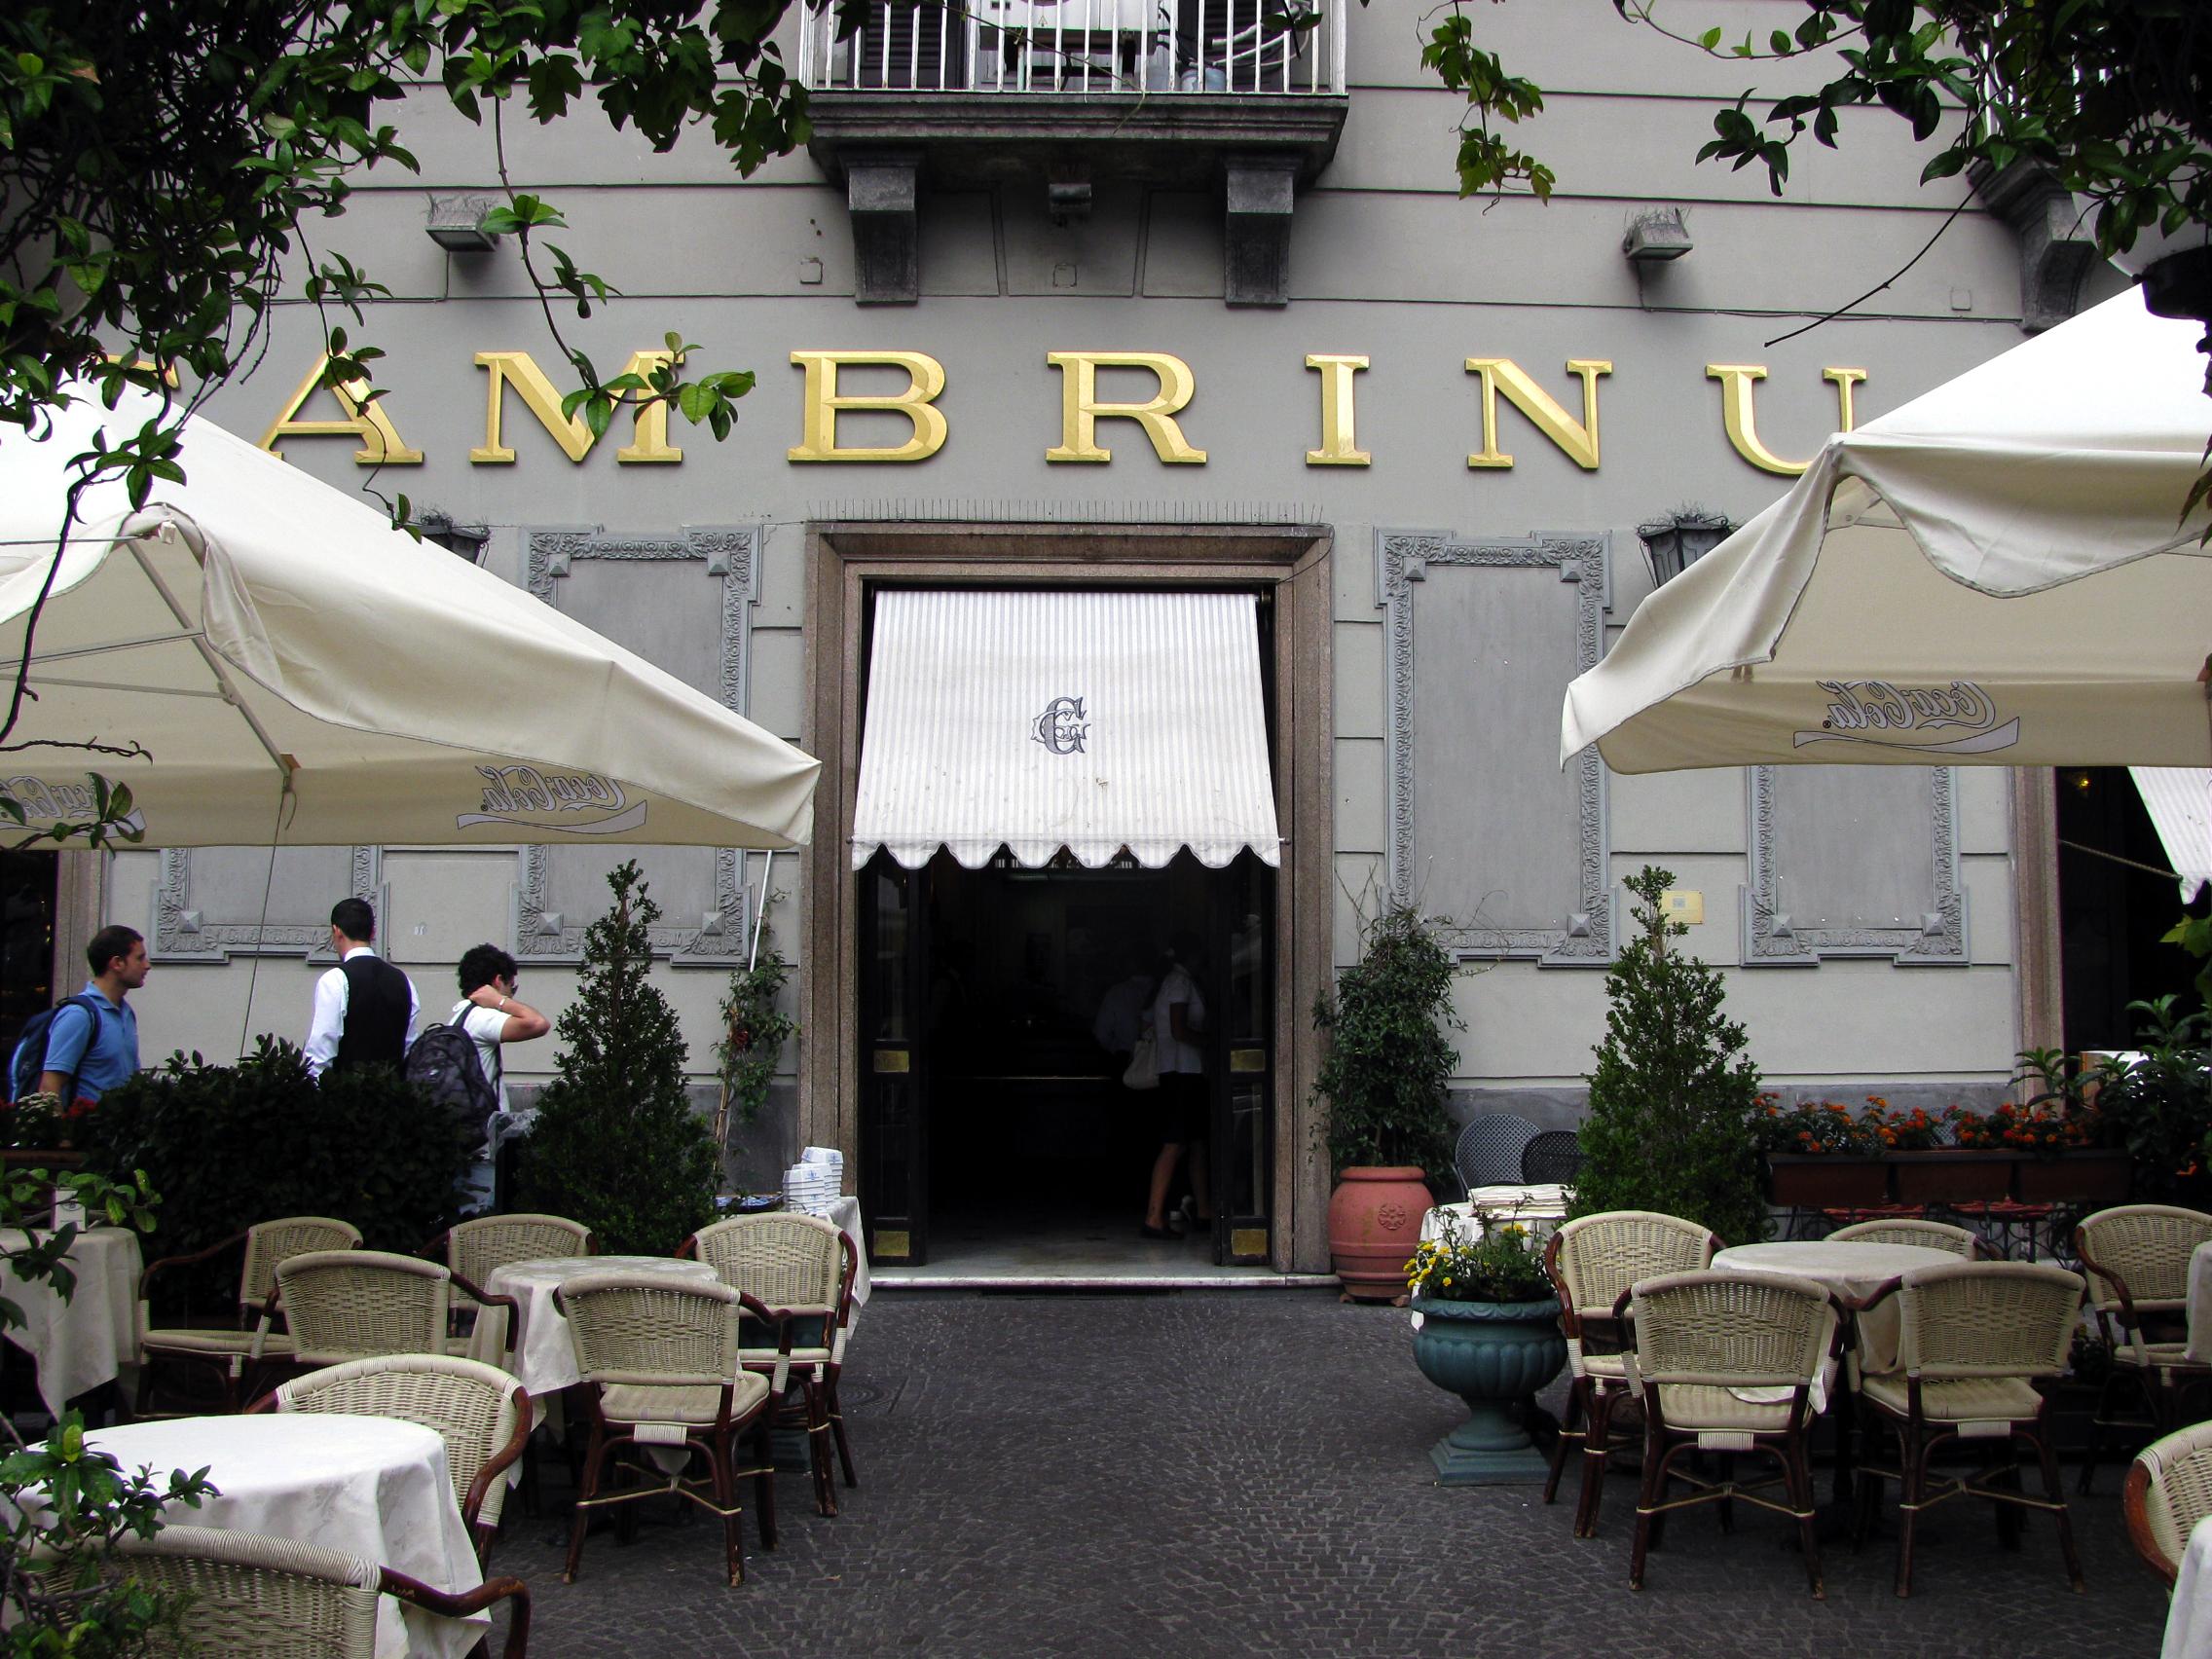 Gambrinus chiude